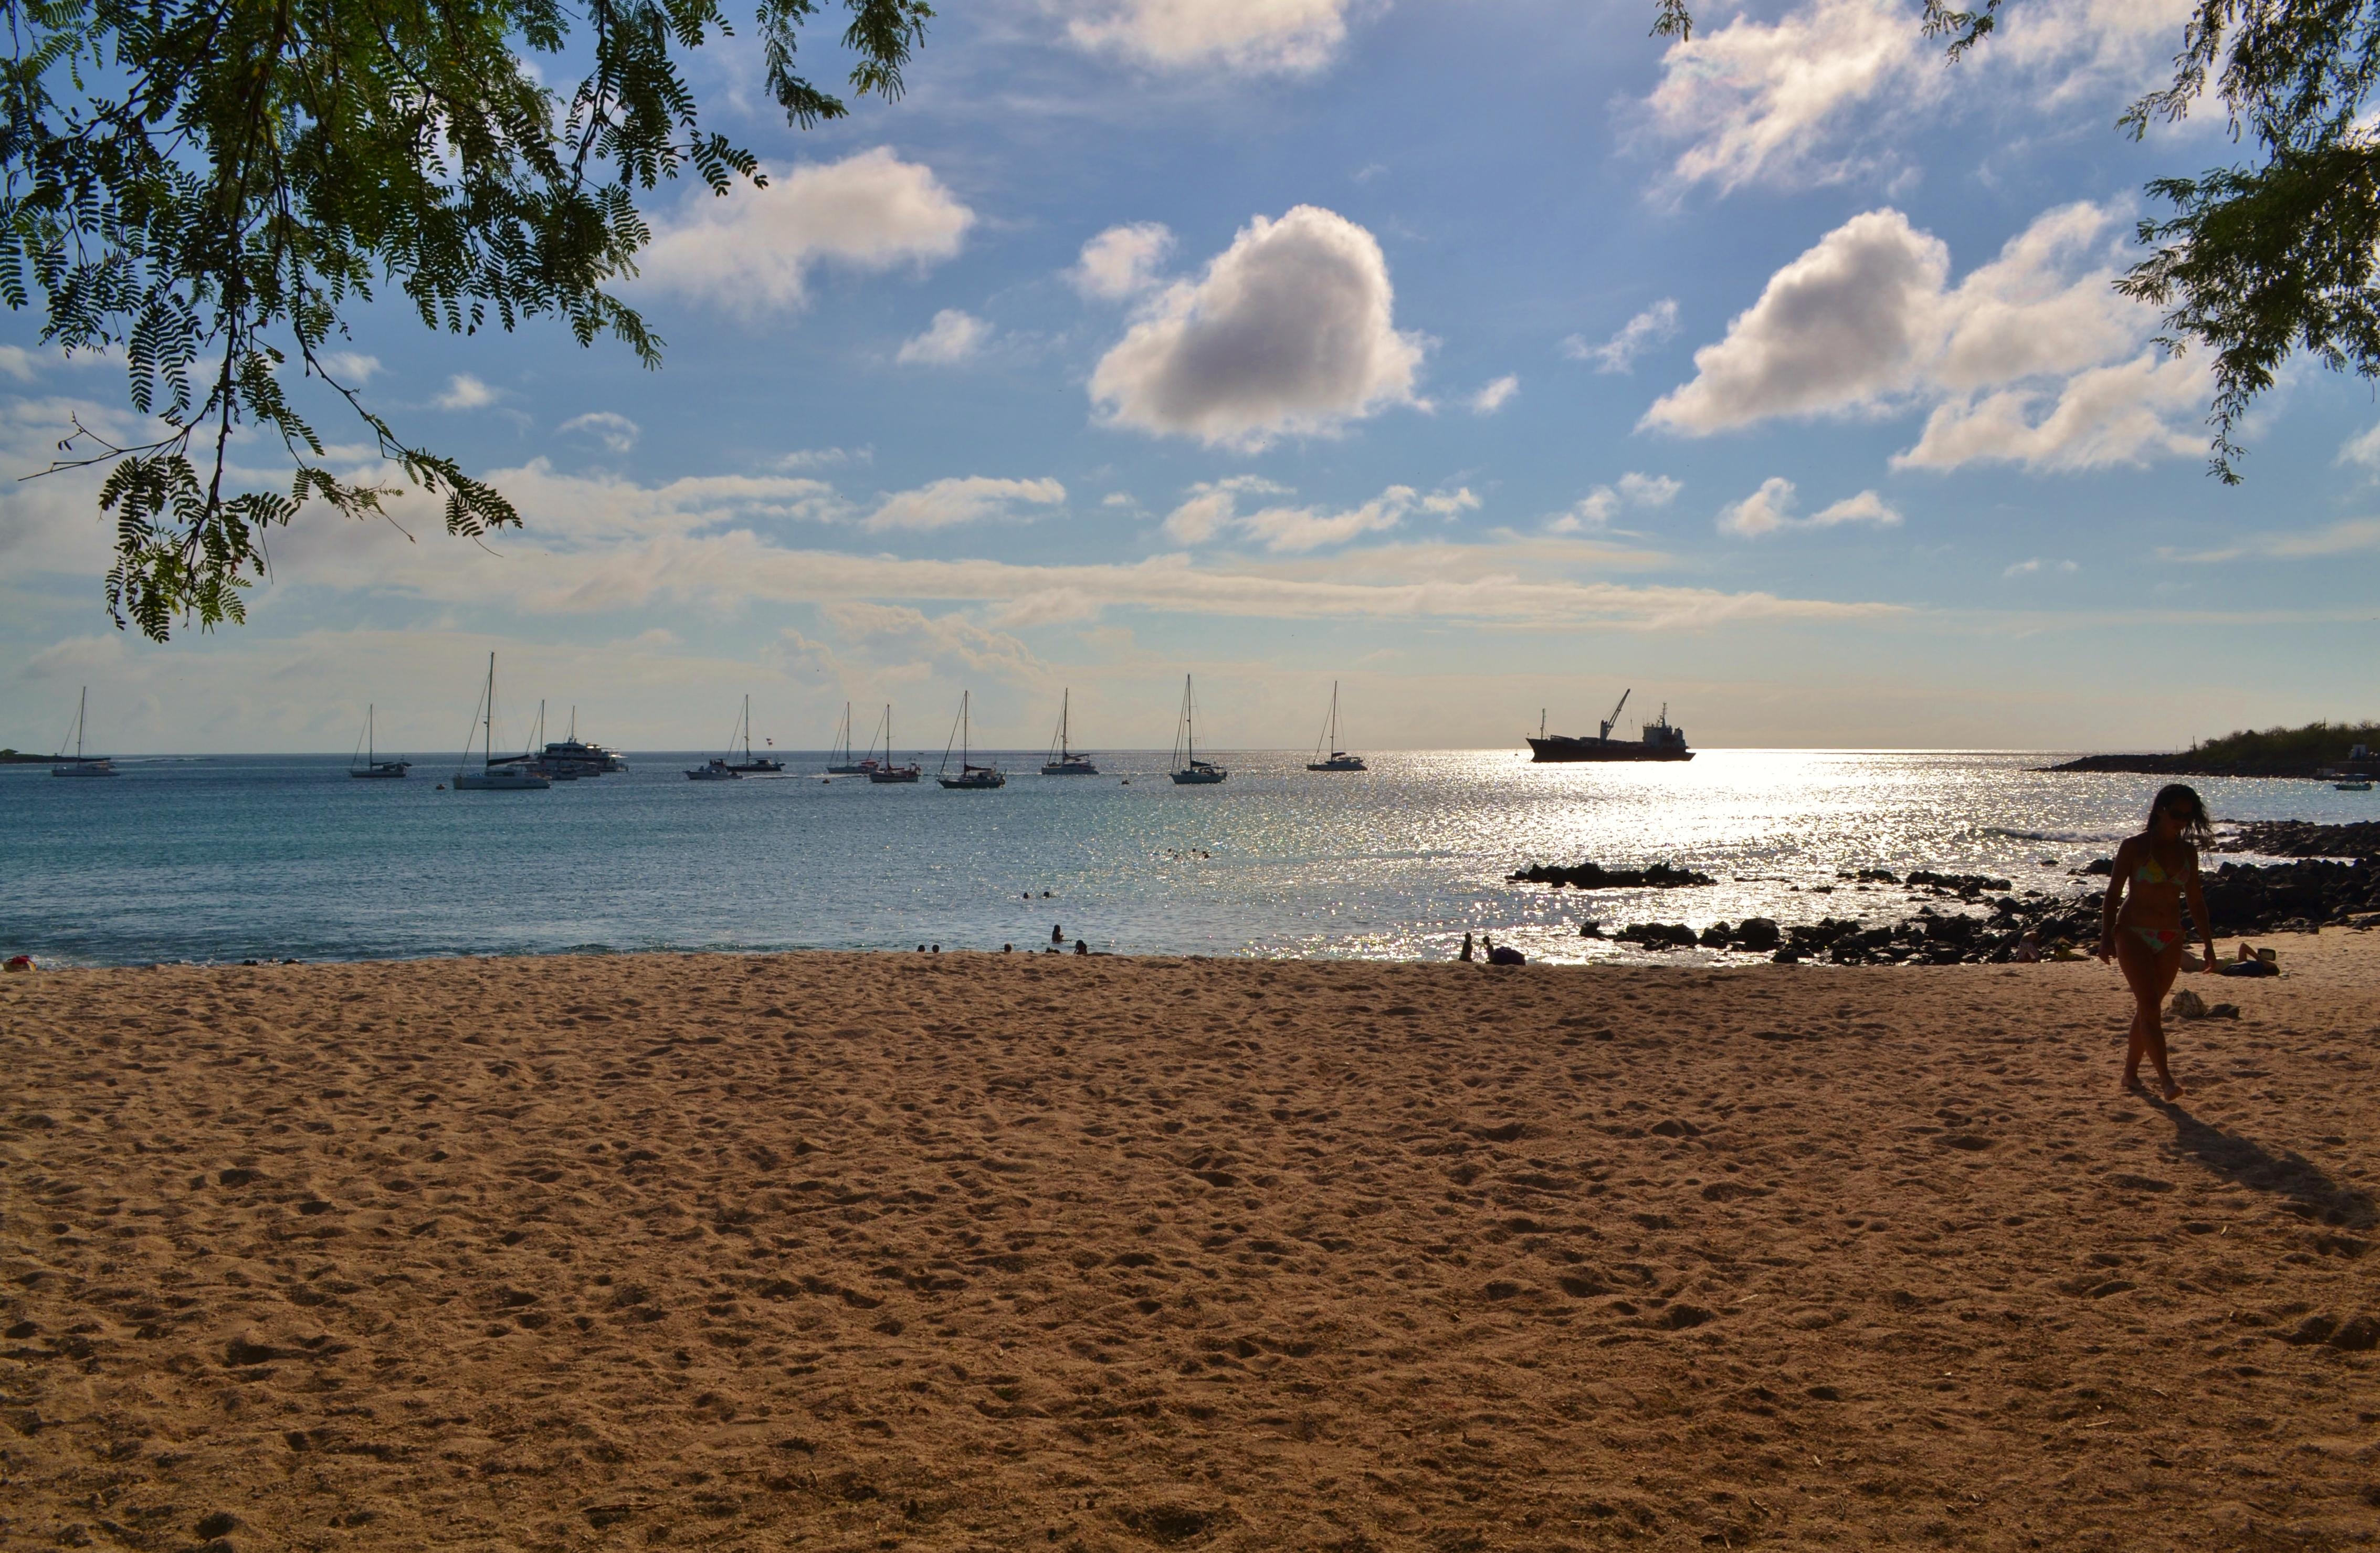 Islas de Galapagos sunset playa mann